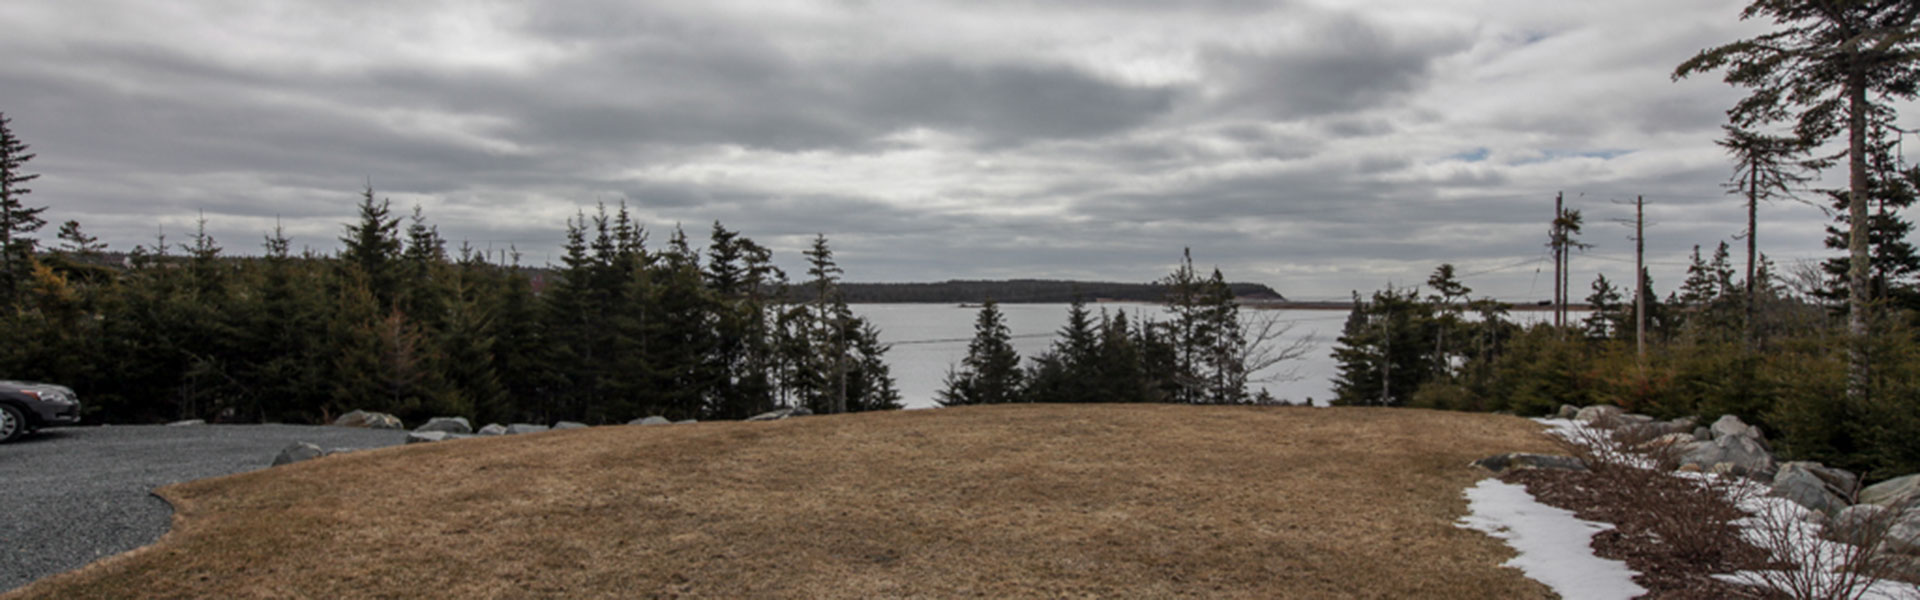 kaufinseln - ostrea lake estate - nova scotia